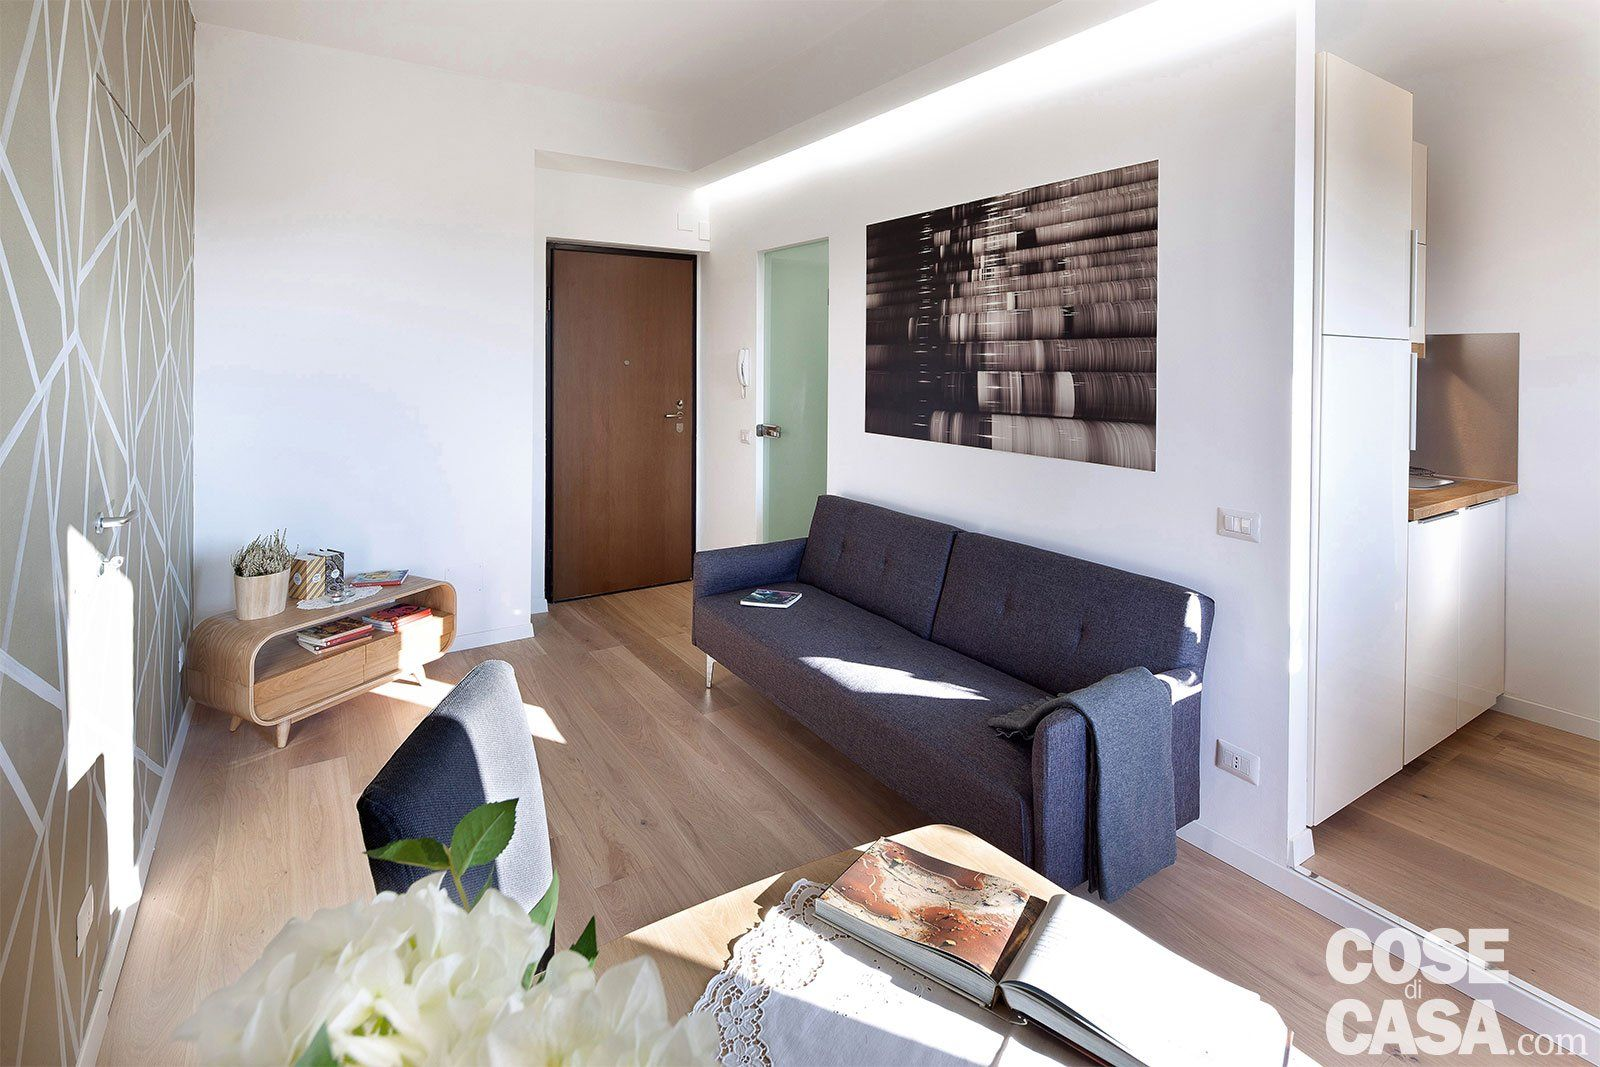 Bilocale di 40 mq casa mini, comfort maxi Idee per